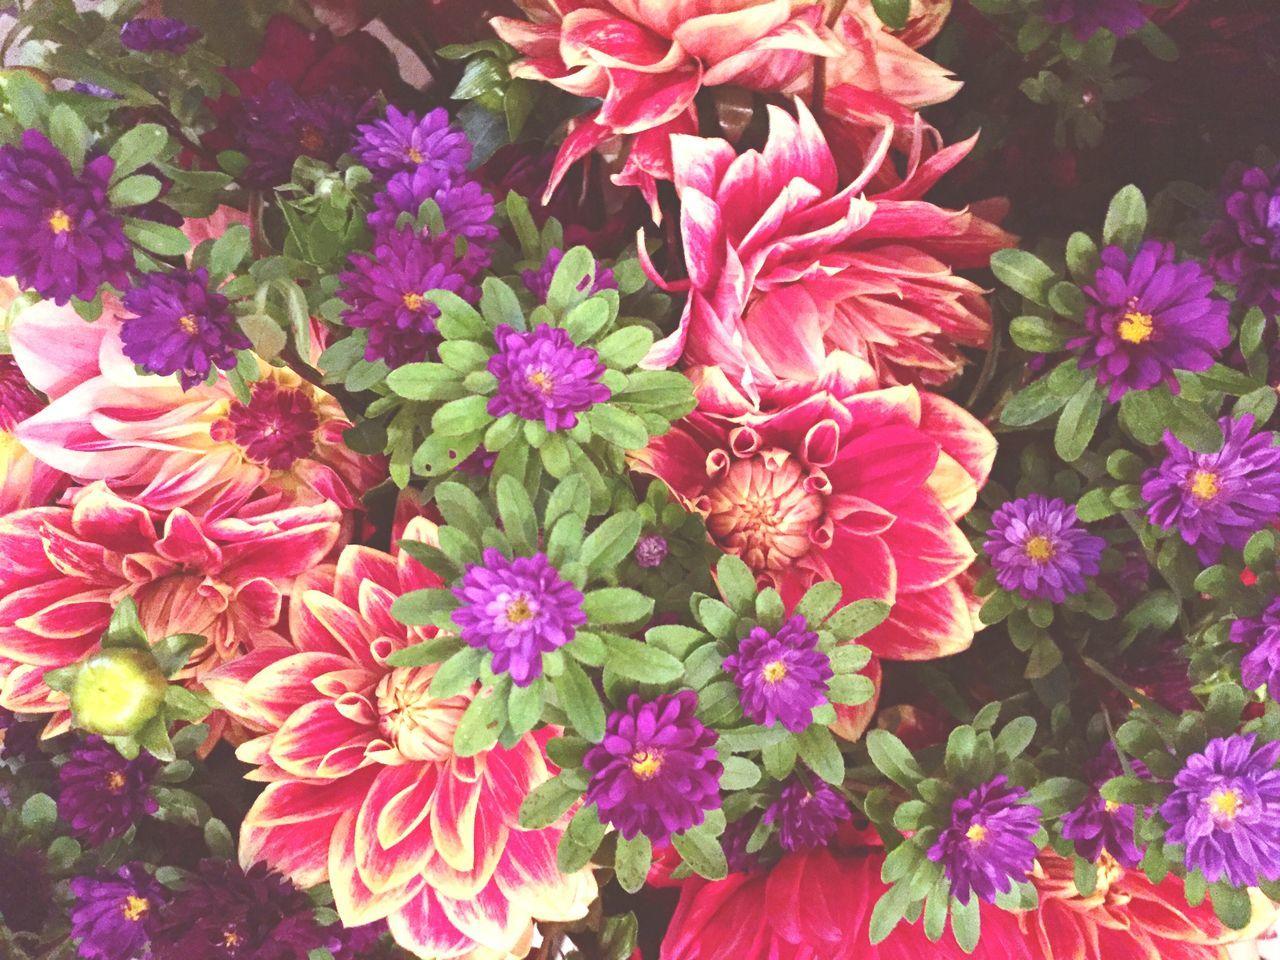 Full Frame Shot Of Flowers Growing On Plant